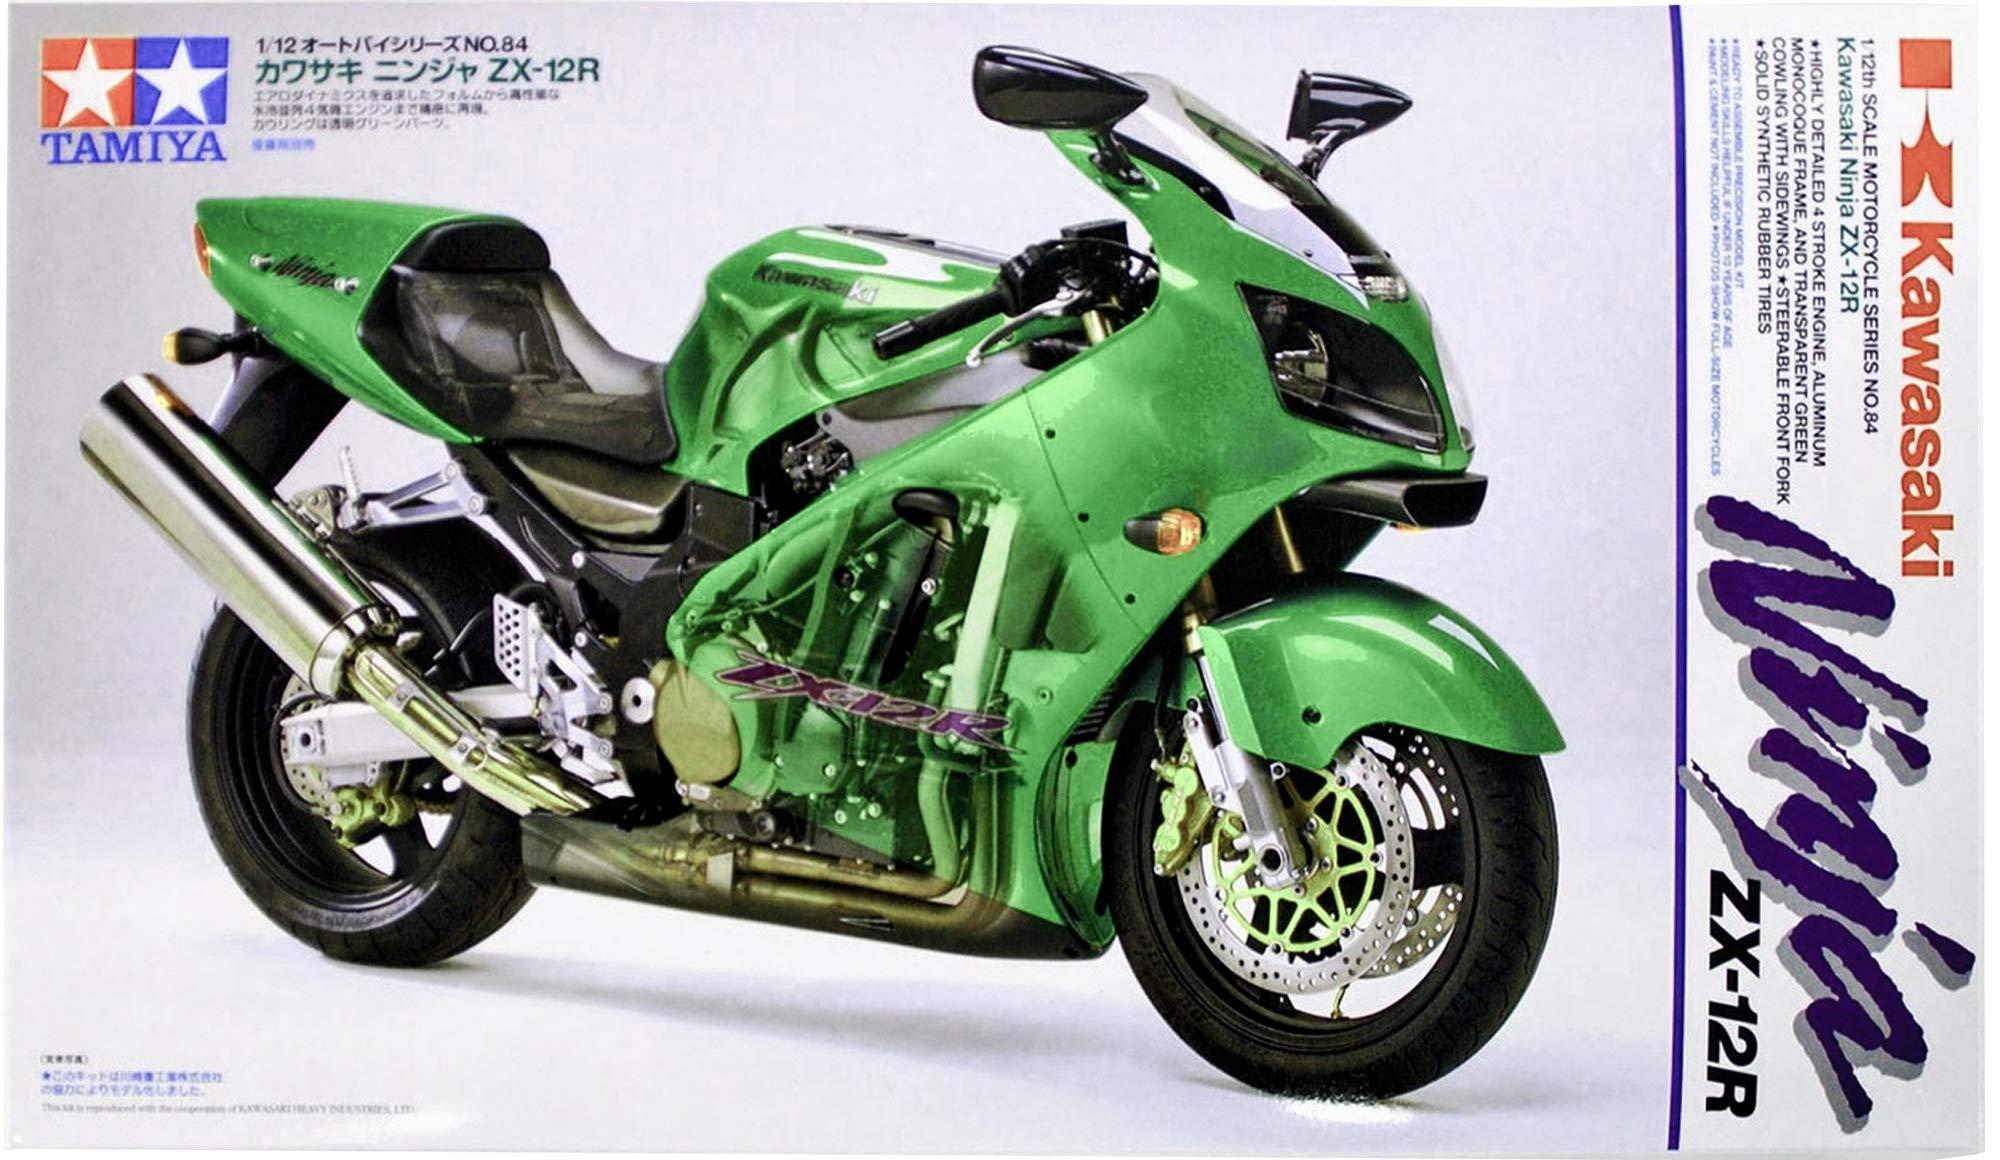 1:12 Scale 300014090 Tamiya Suzuki GSX1300R Hayabusa Street 98 Model Motorcycle